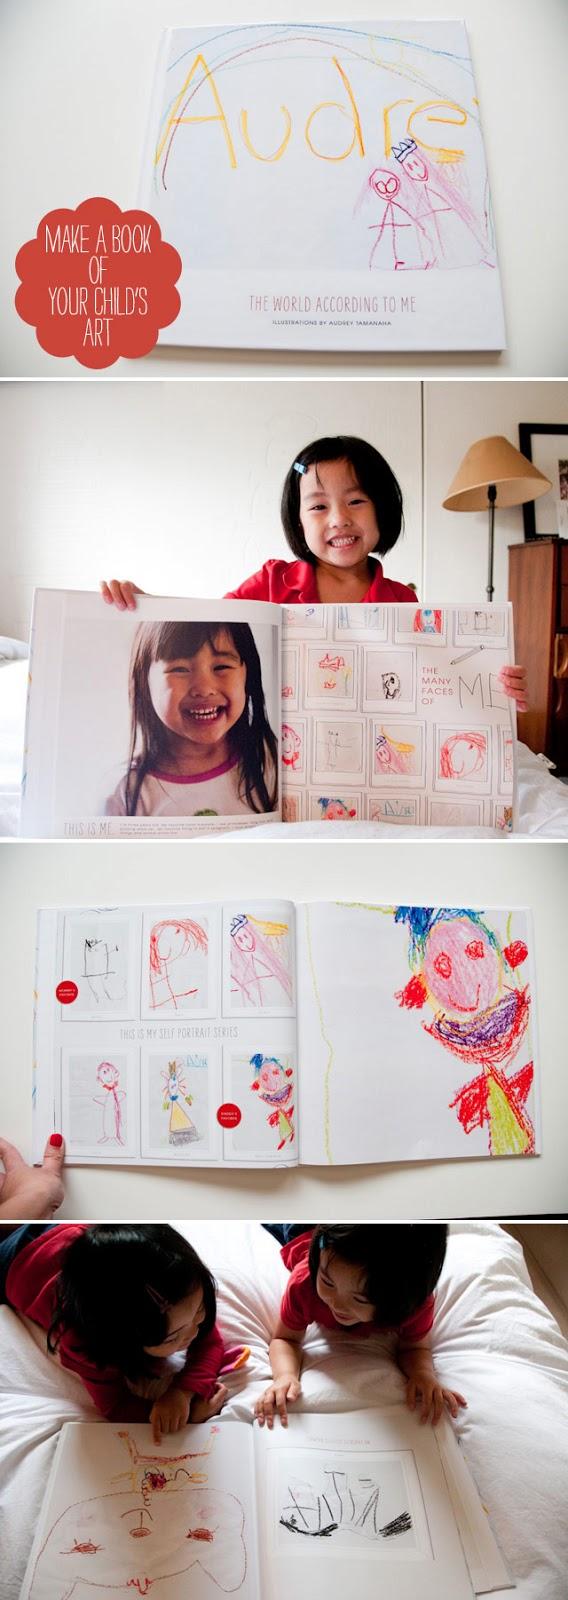 Dibujos niños Desenhos crianças Kids Drawings